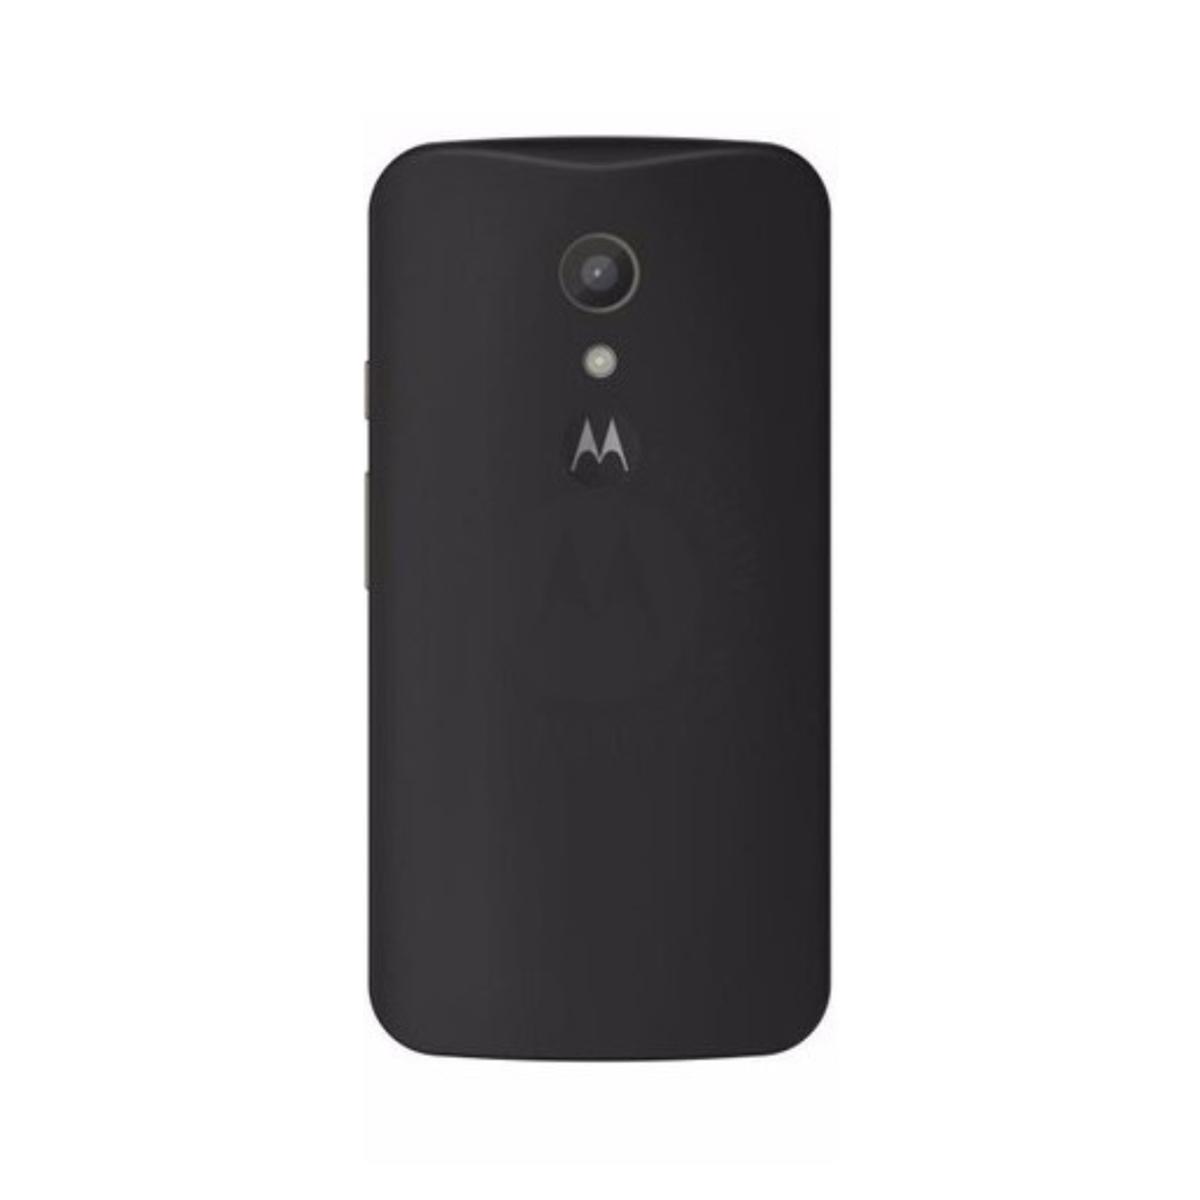 Smartphone Motorola Moto G 2ª Geração Dtv Xt1069 - Seminovo